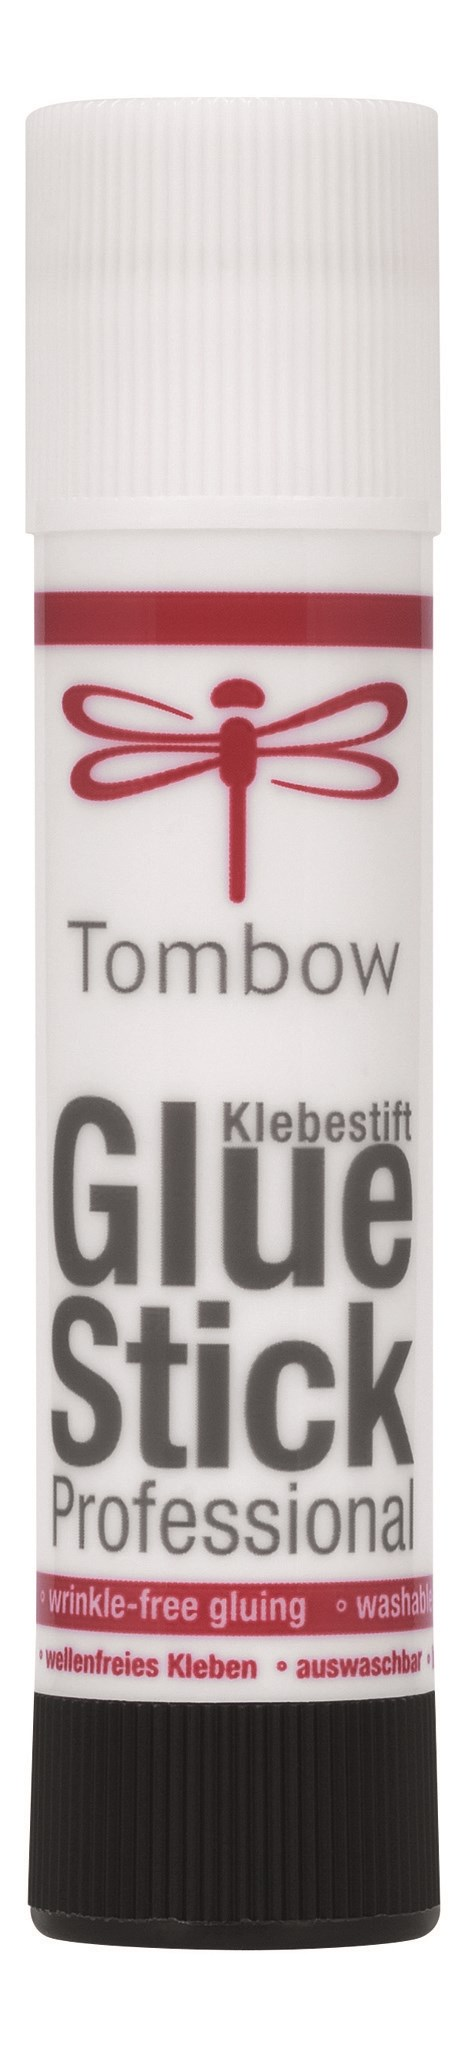 Tombow limstift,  10 g, 1st.